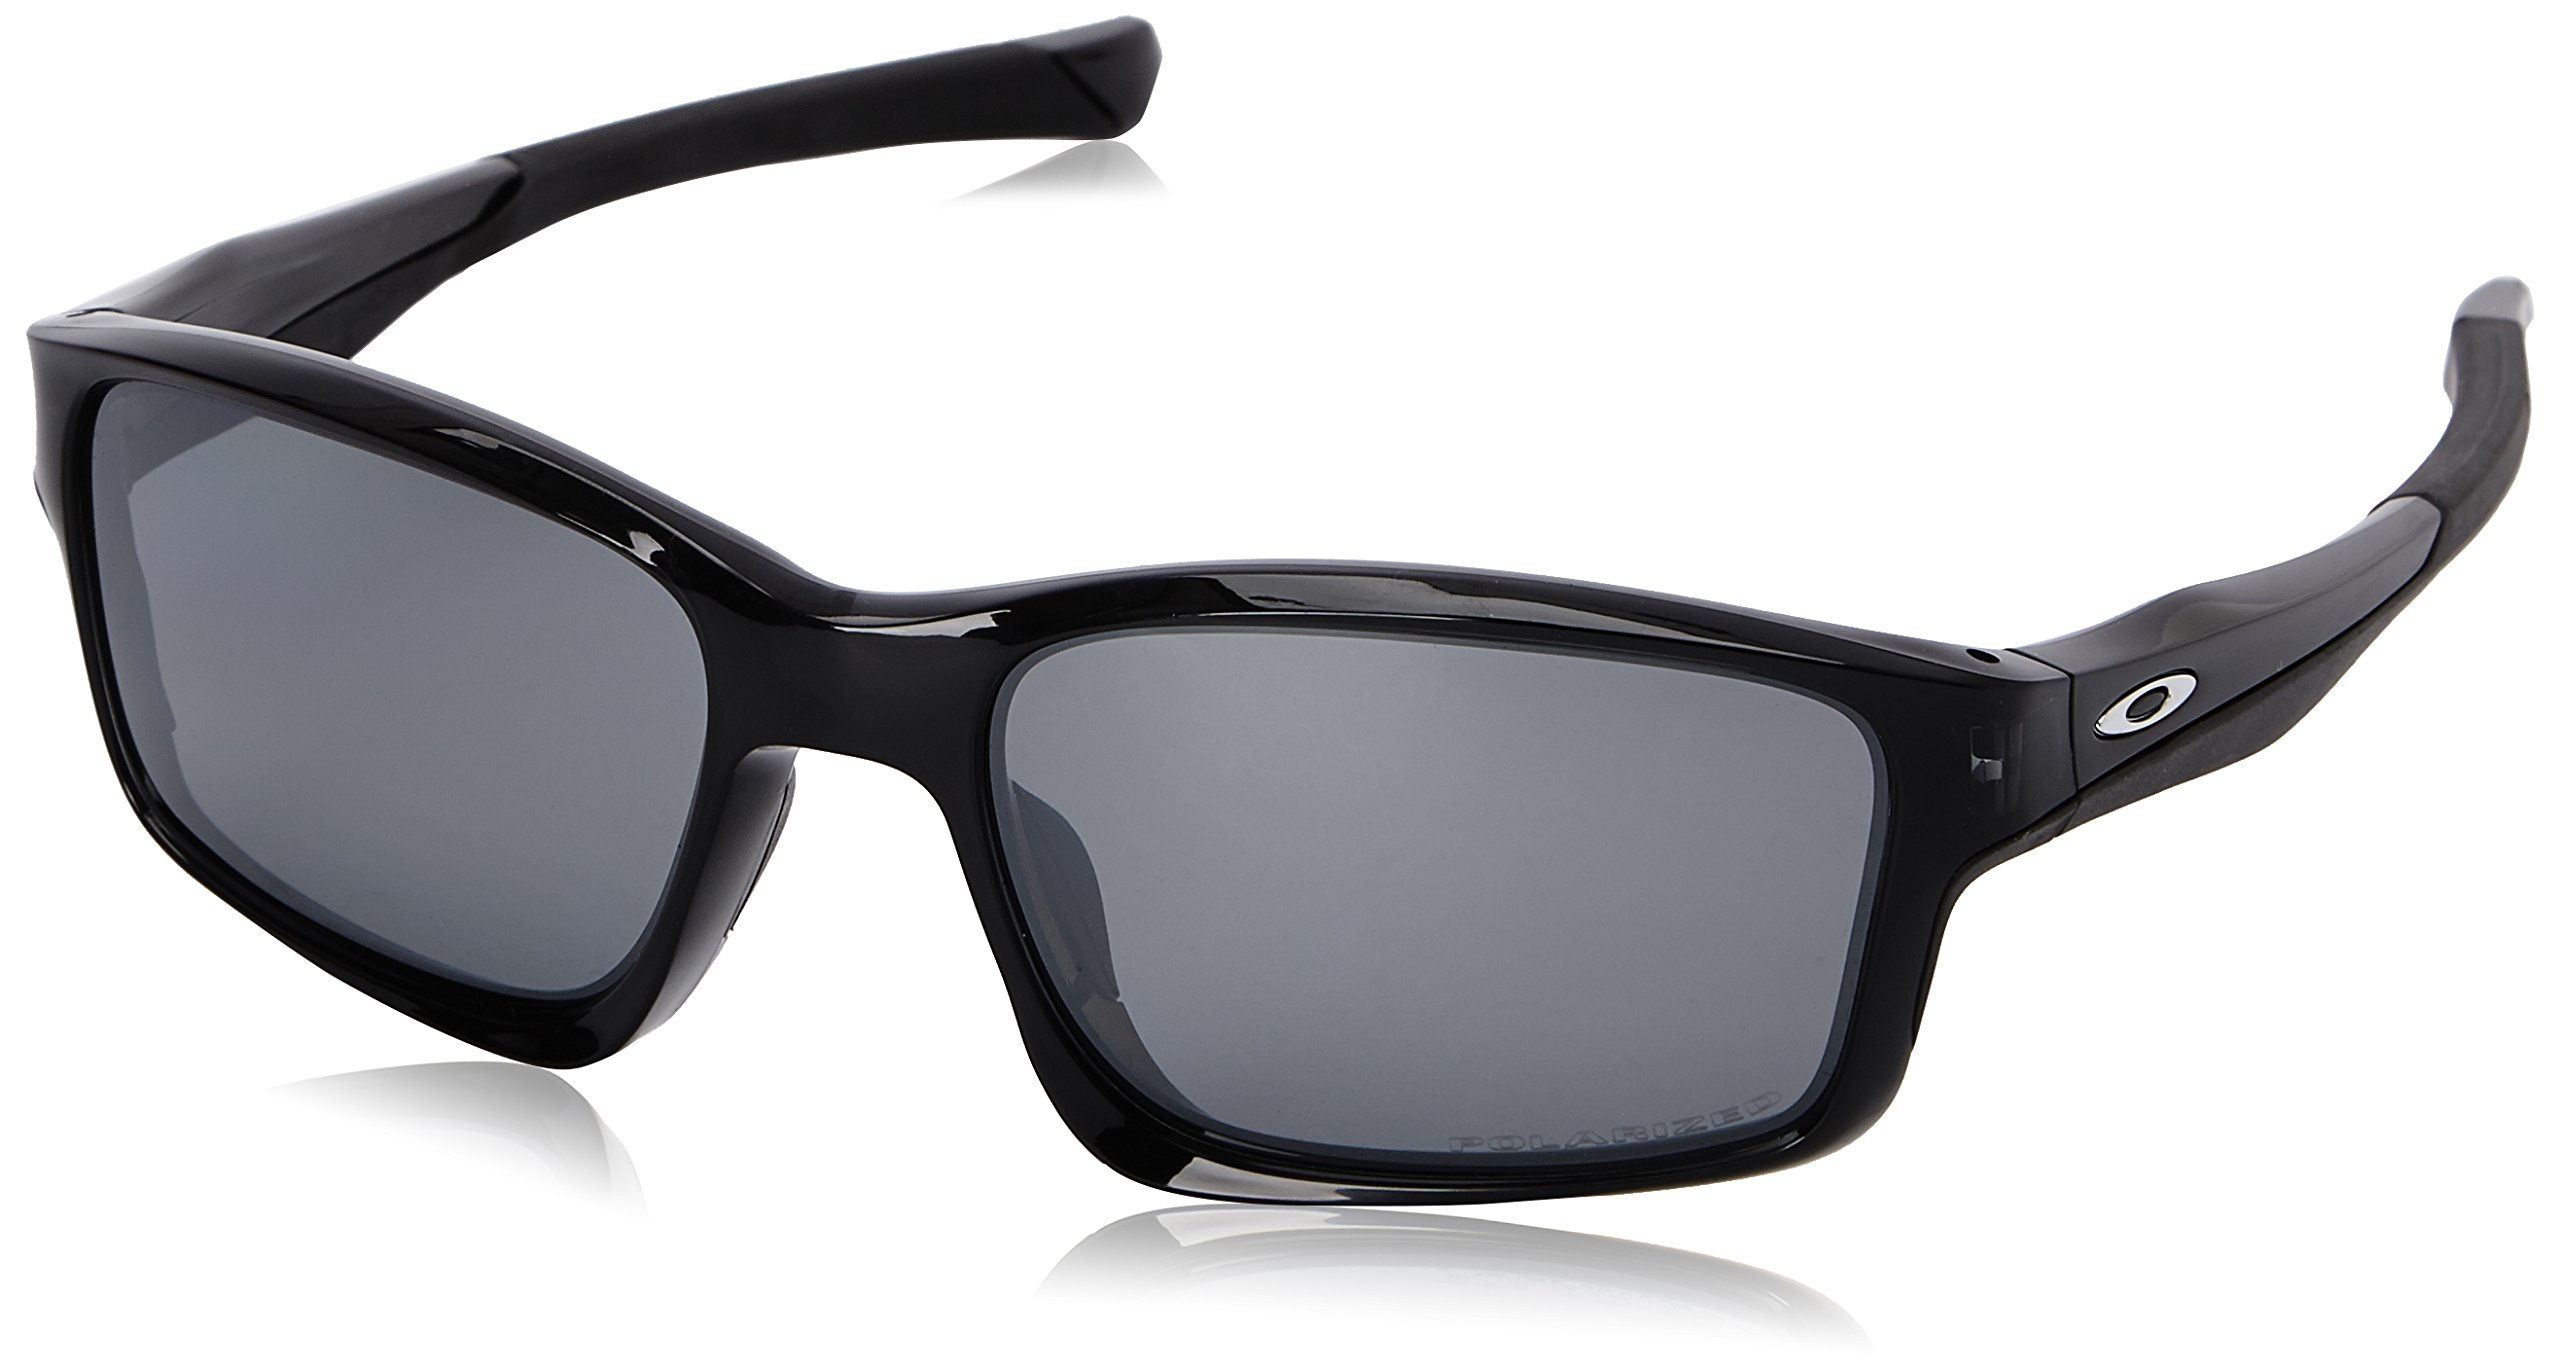 Oakley Mens Chailink OO9247-09 Polarized Ractangular Eyeglasses, Black Ink, 57 mm